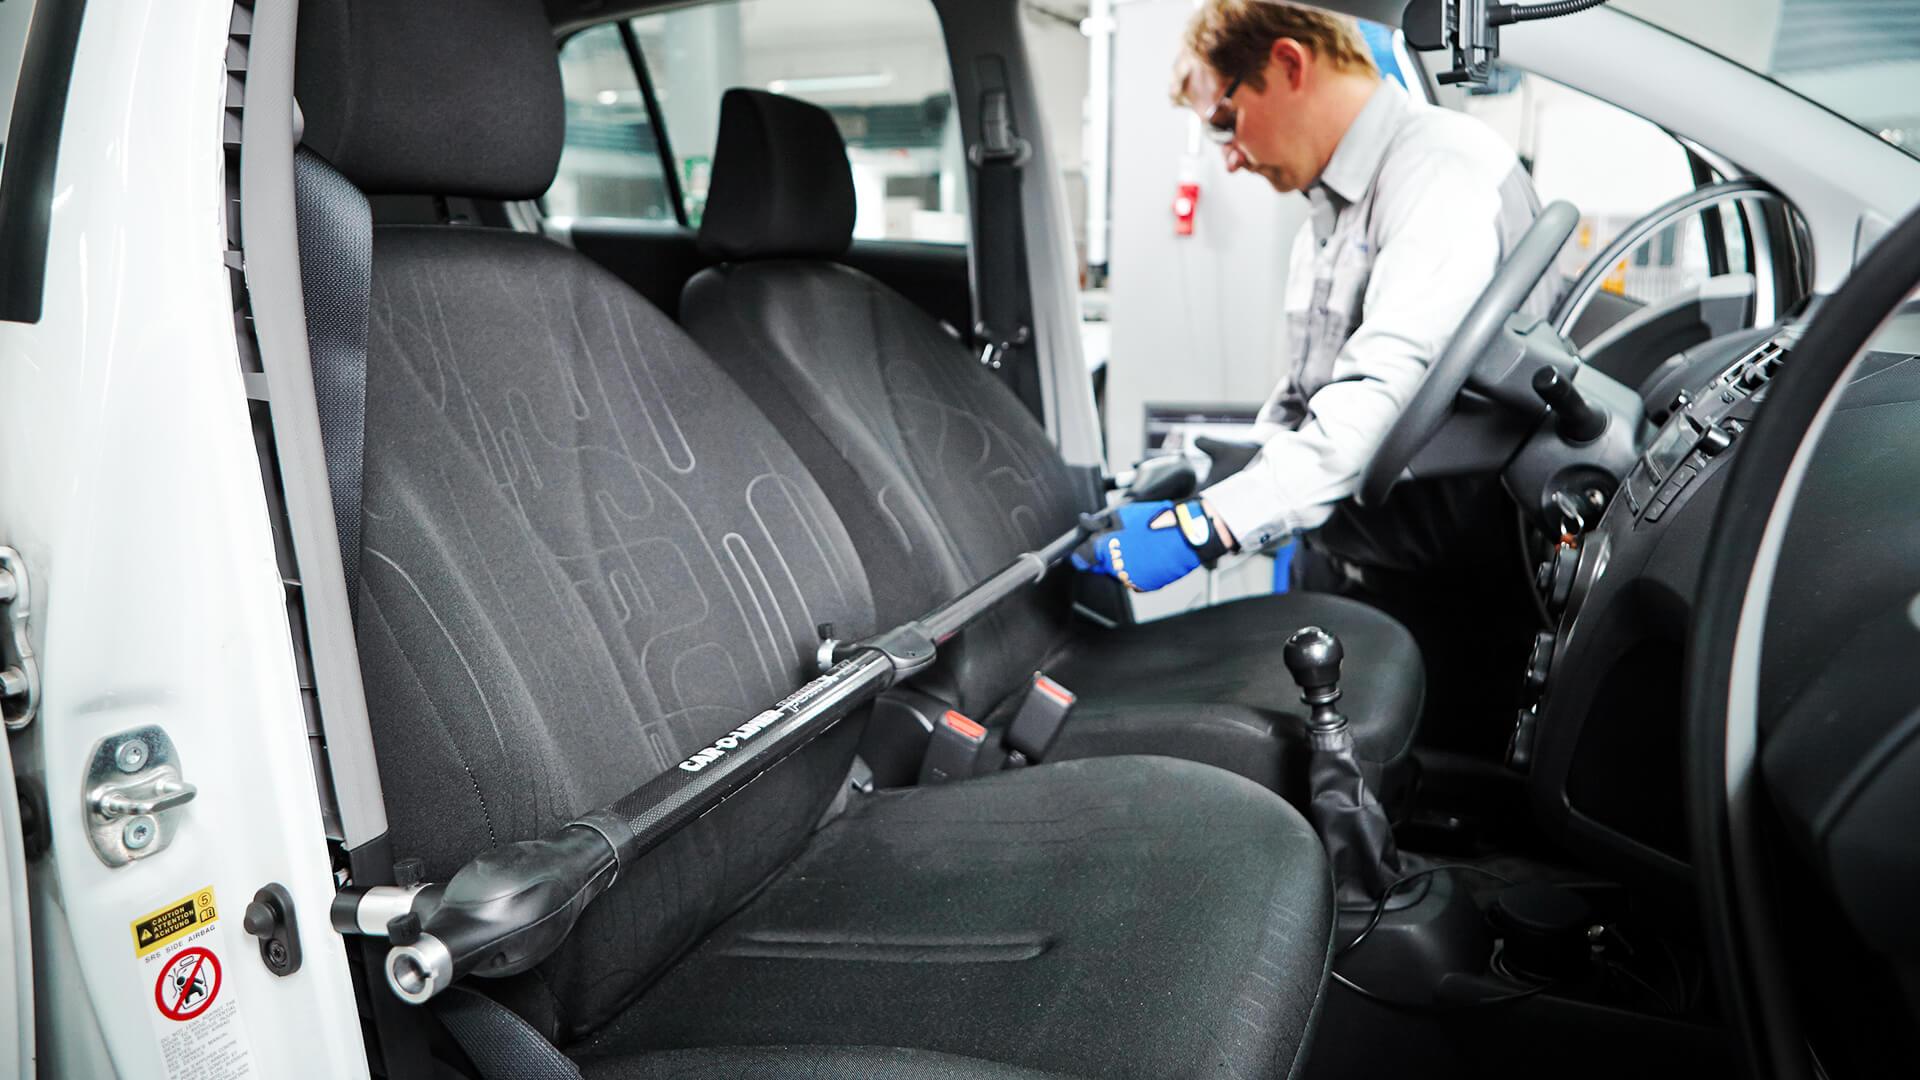 Car Roof Upholstery Repair Cost Dubai - Upholstery